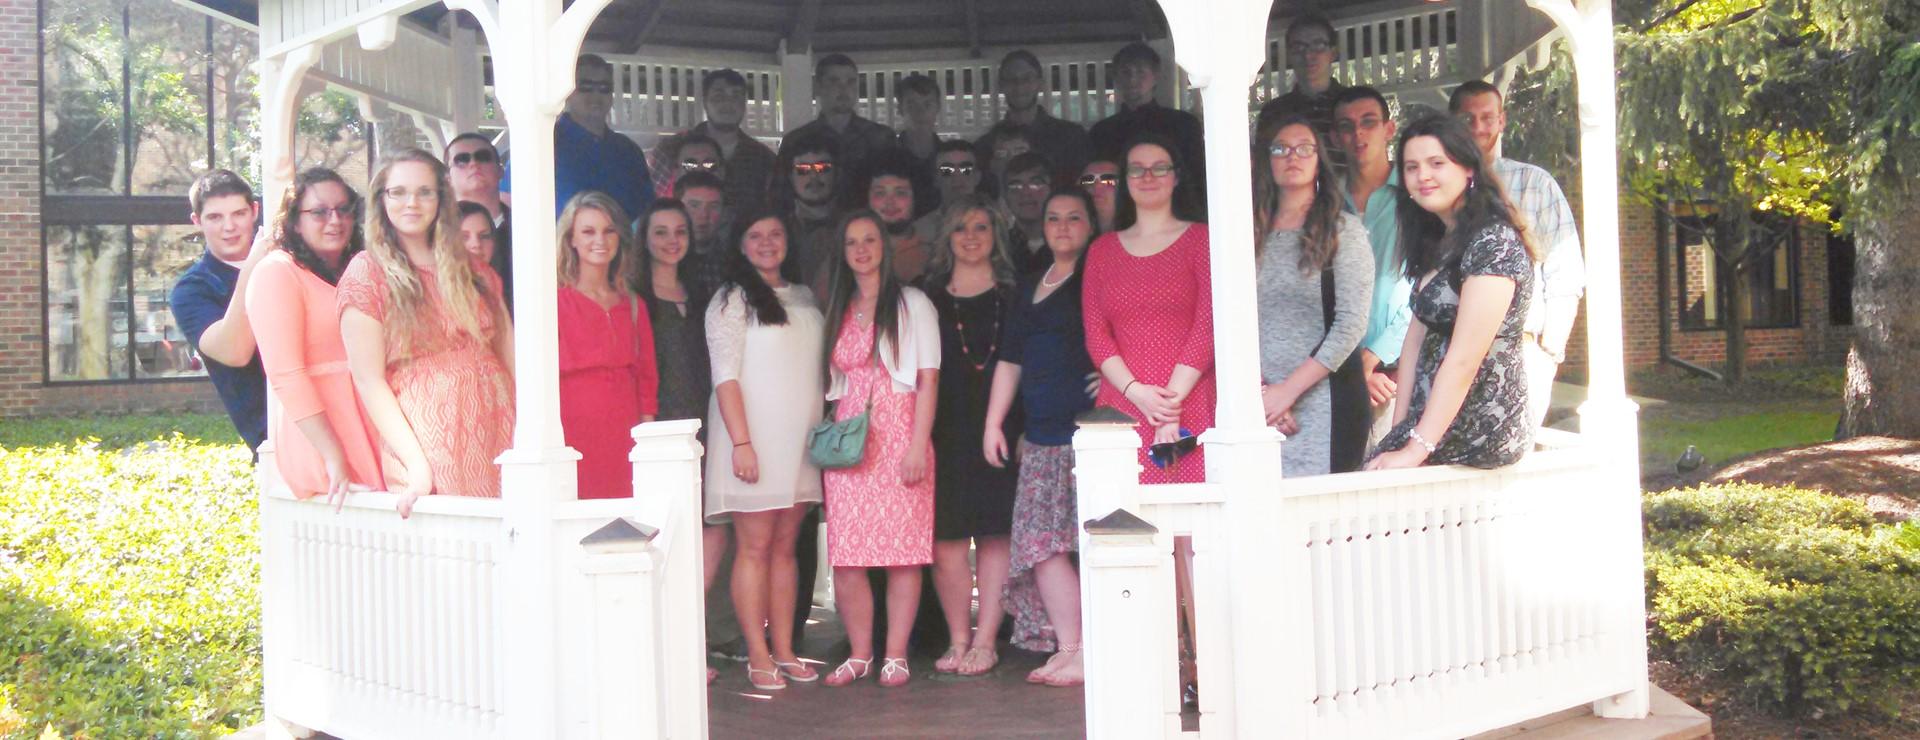 MCHS Senior Trip 2016